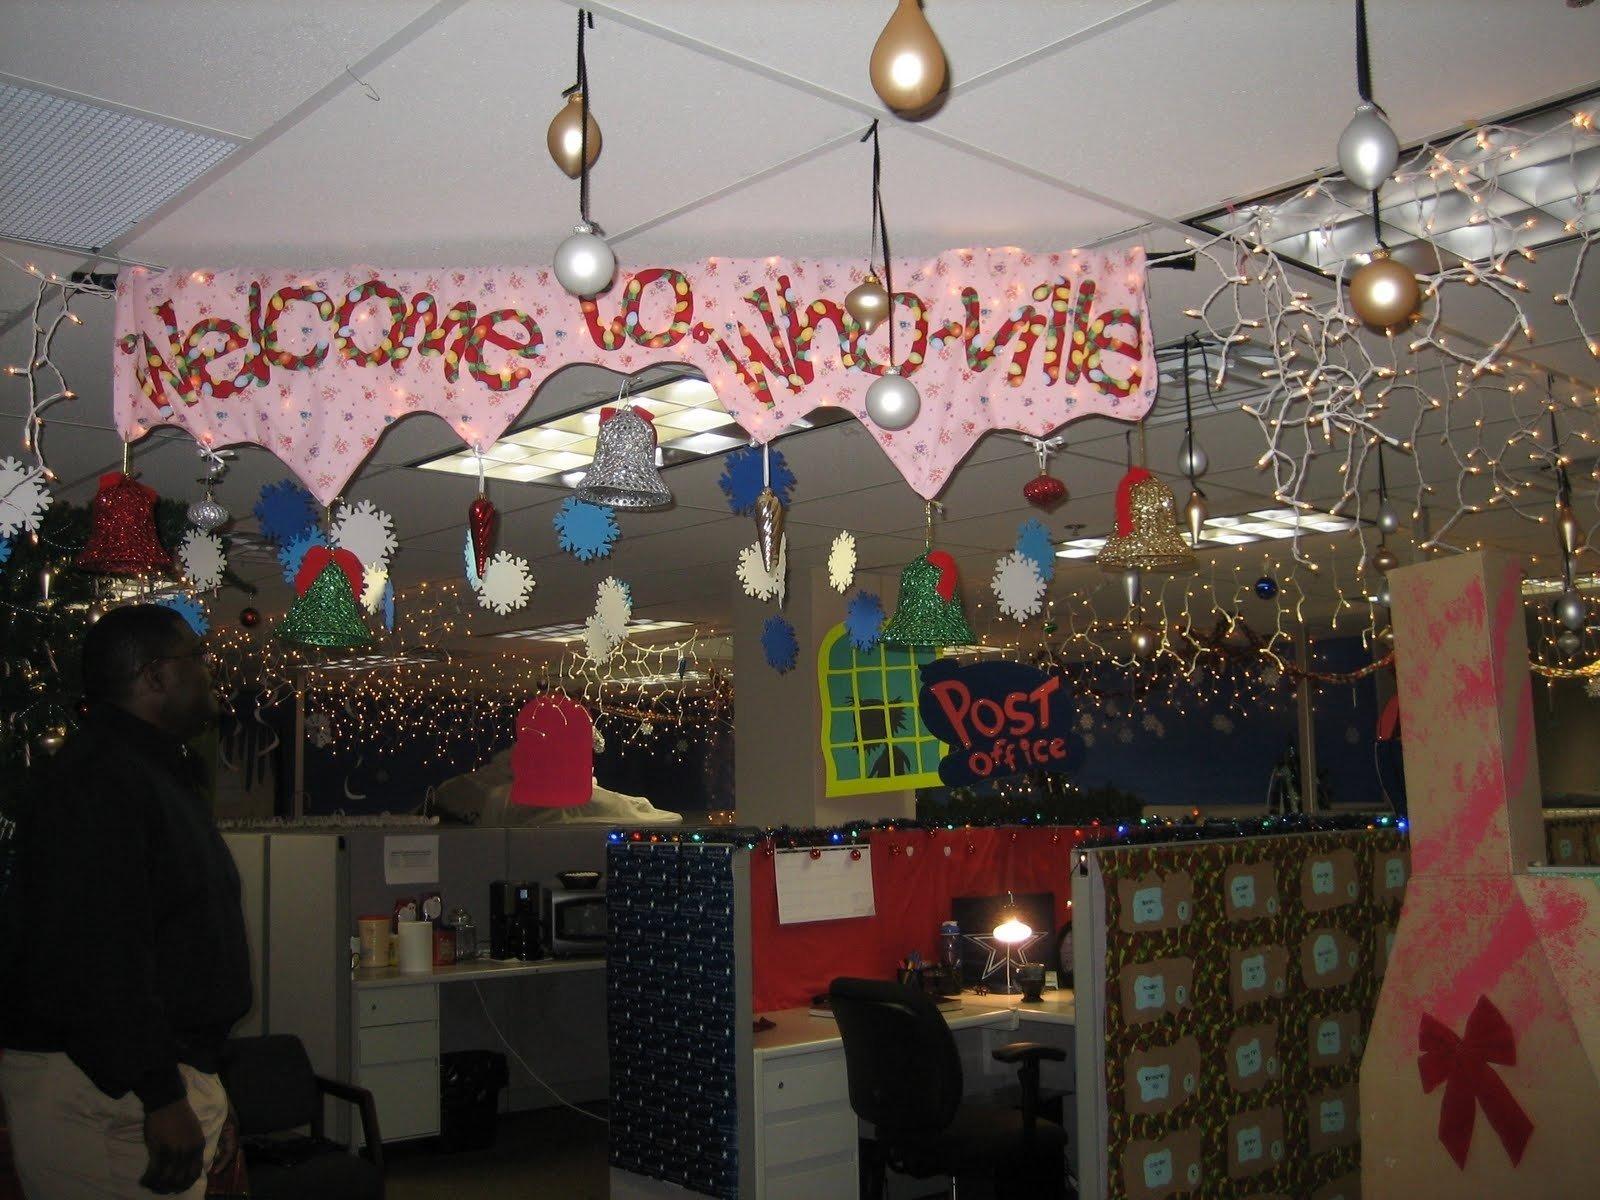 10 Spectacular Office Decorating Ideas For Christmas ivesons christmas office decorating contest home art decor 10837 2021